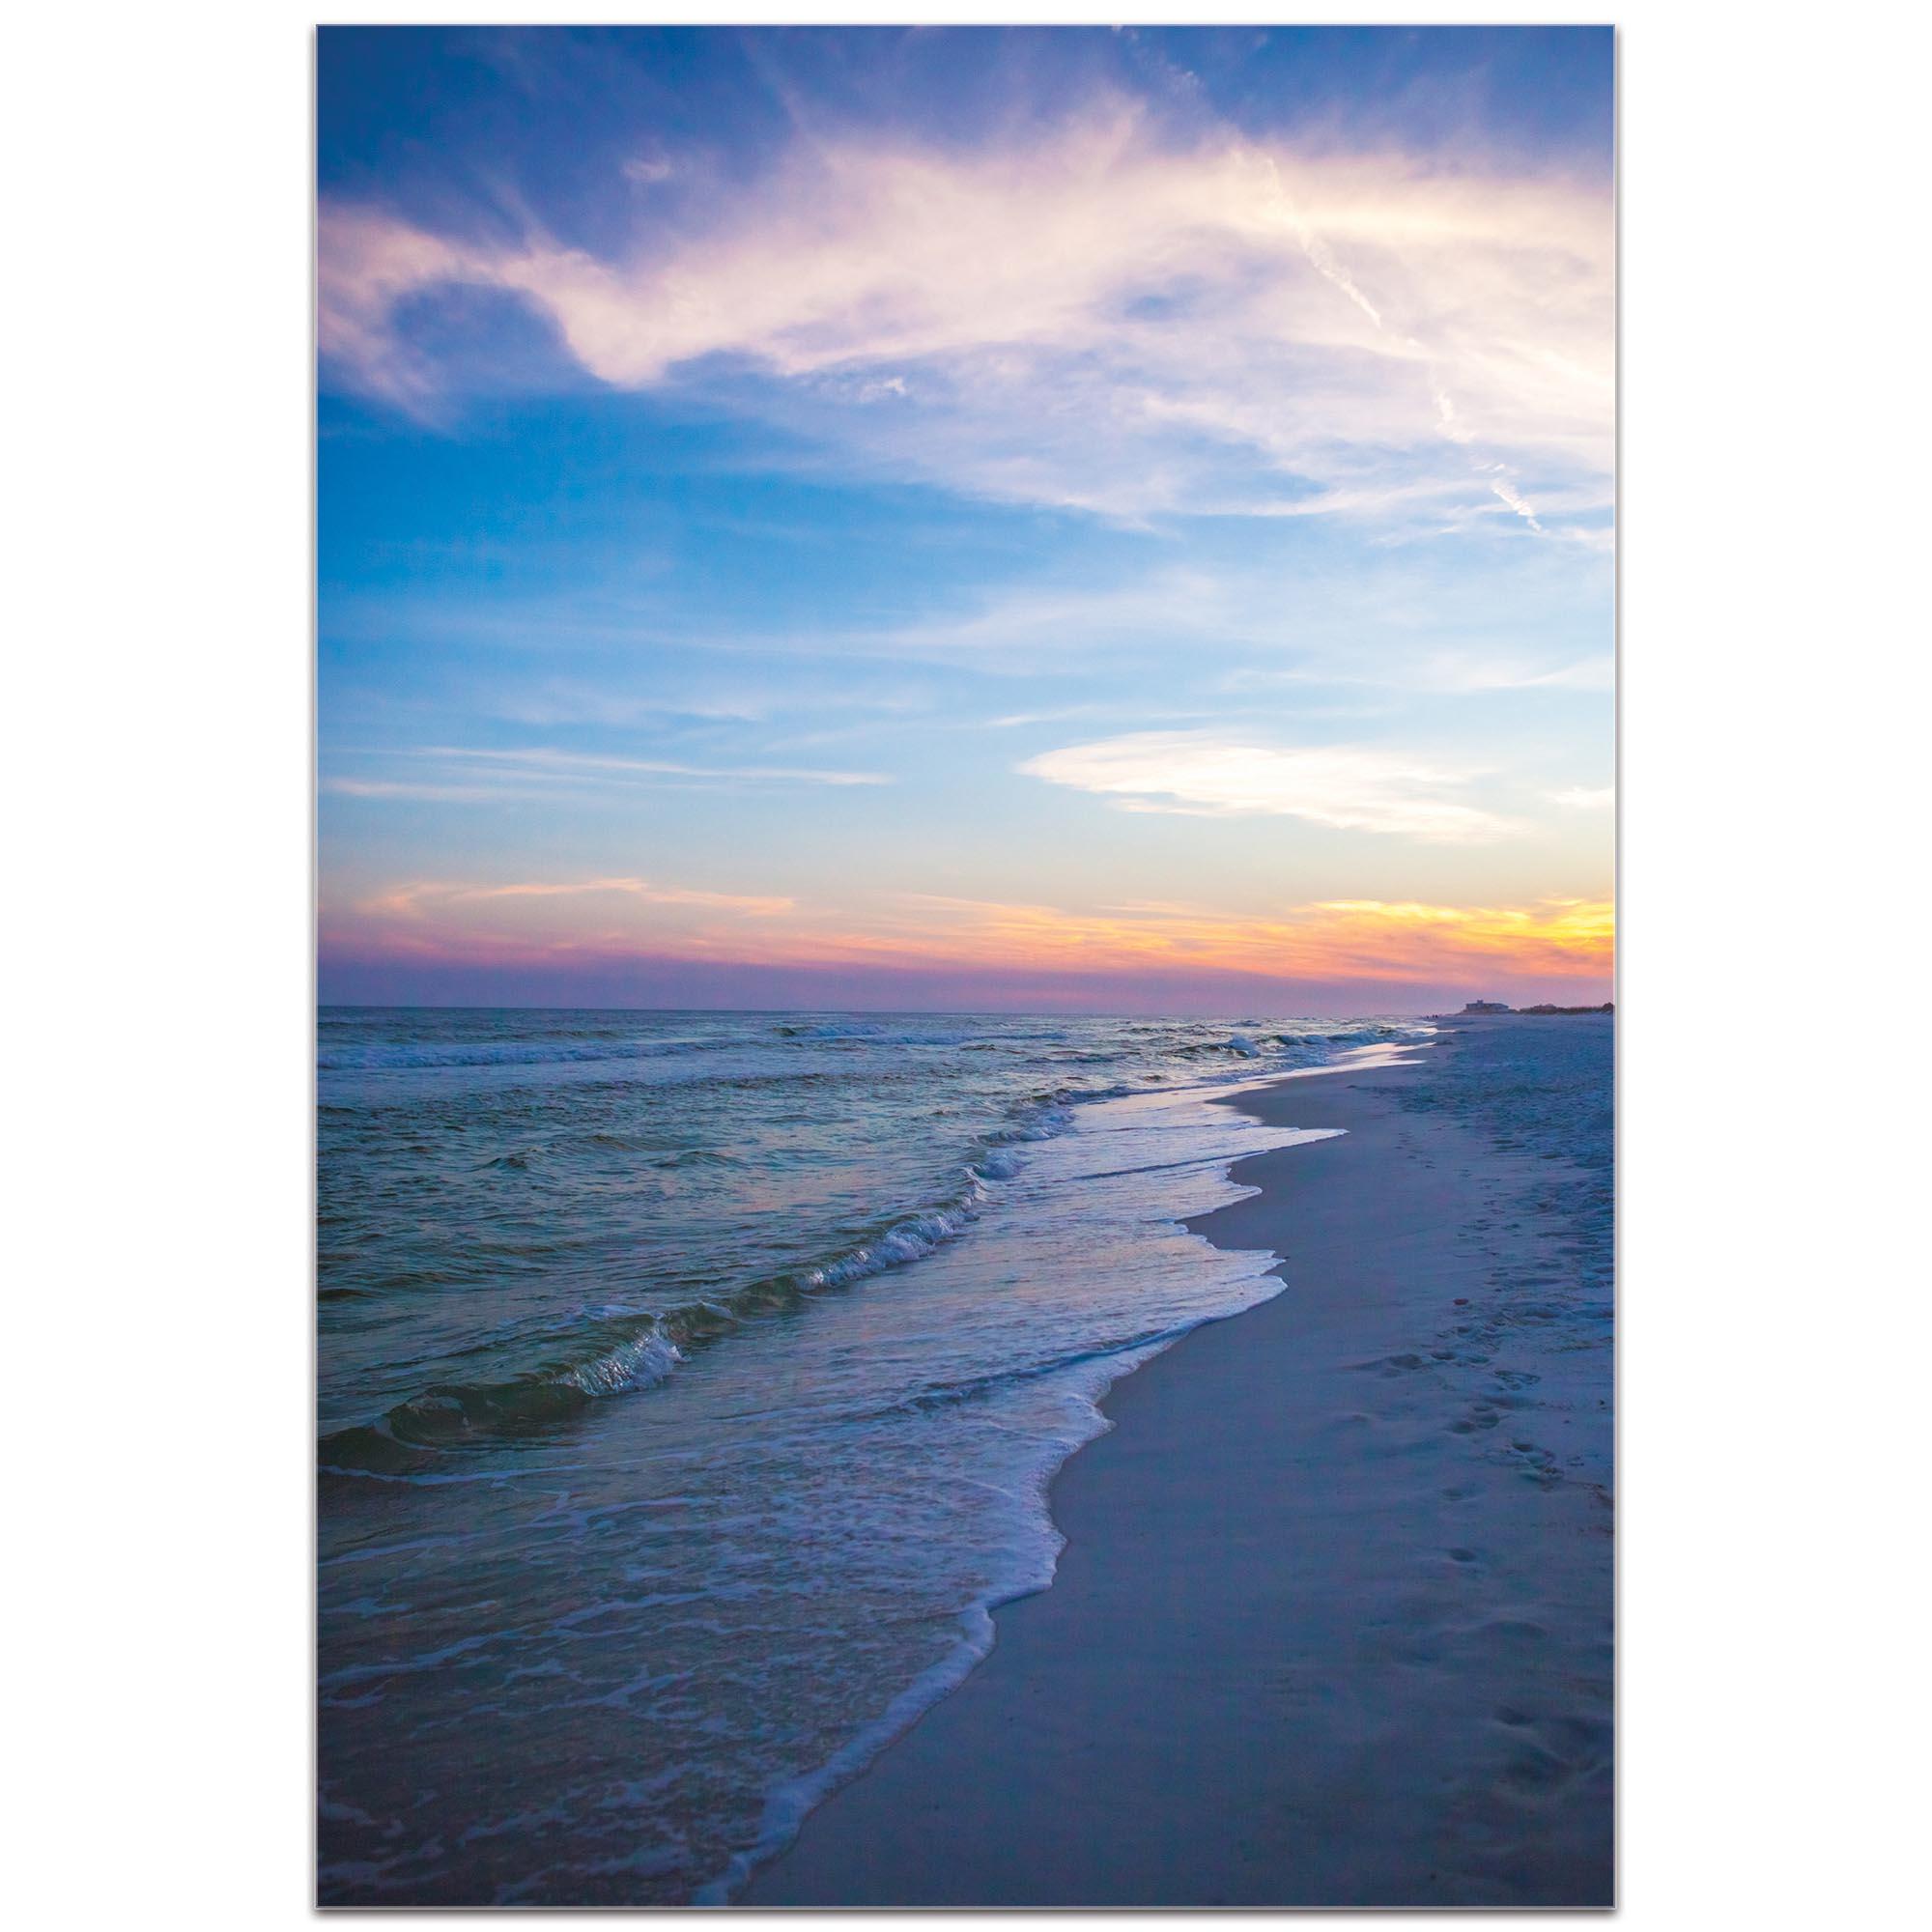 Coastal Wall Art 'Sunset Shores' - Romantic Sunset Decor on Metal or Plexiglass - Image 2